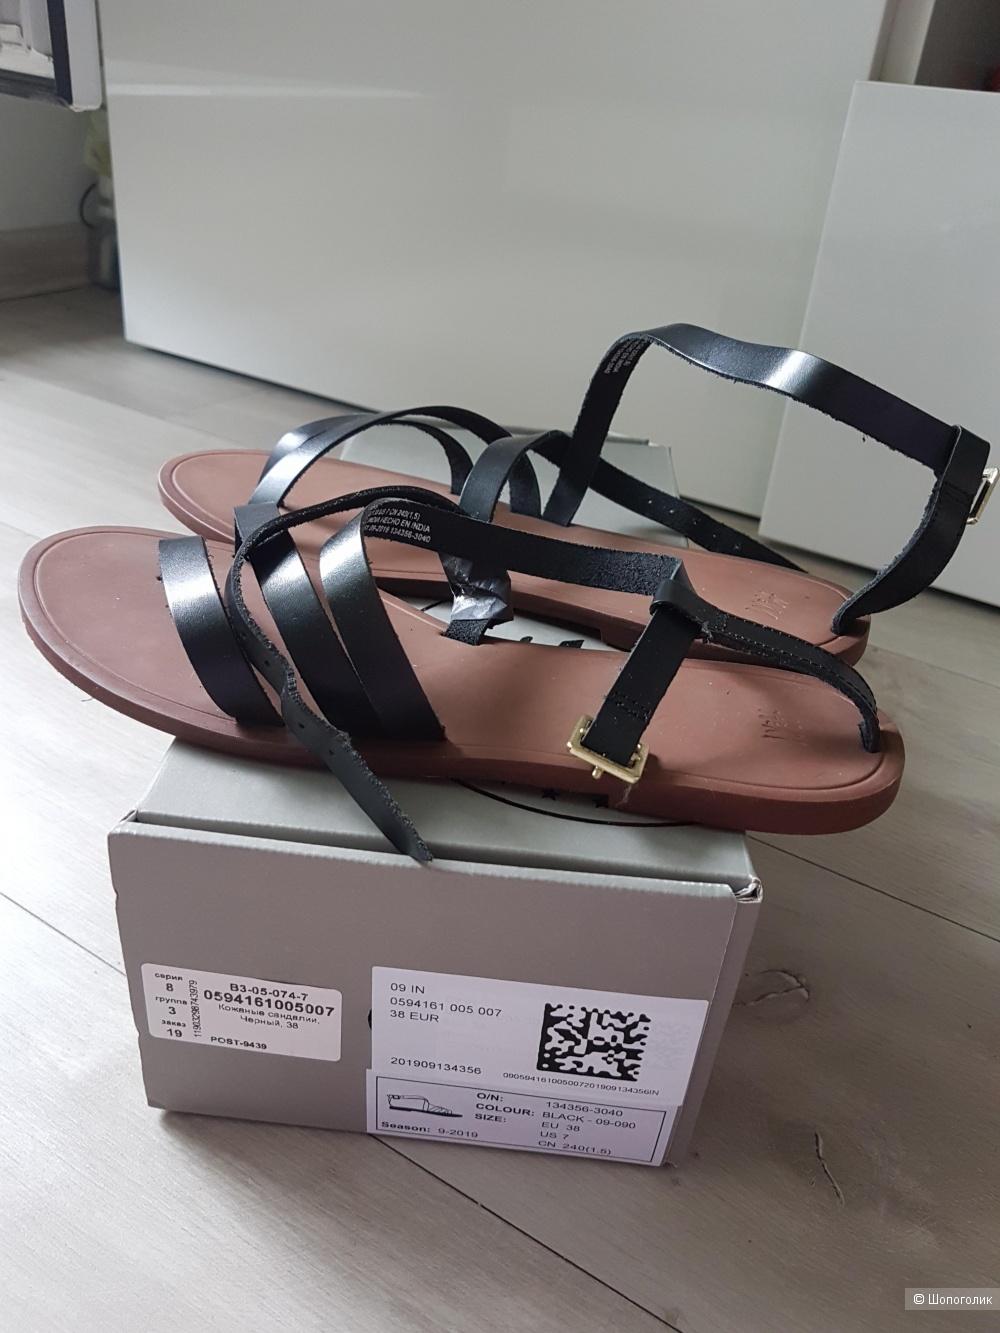 Кожаные сандалии H&M, 38 размер